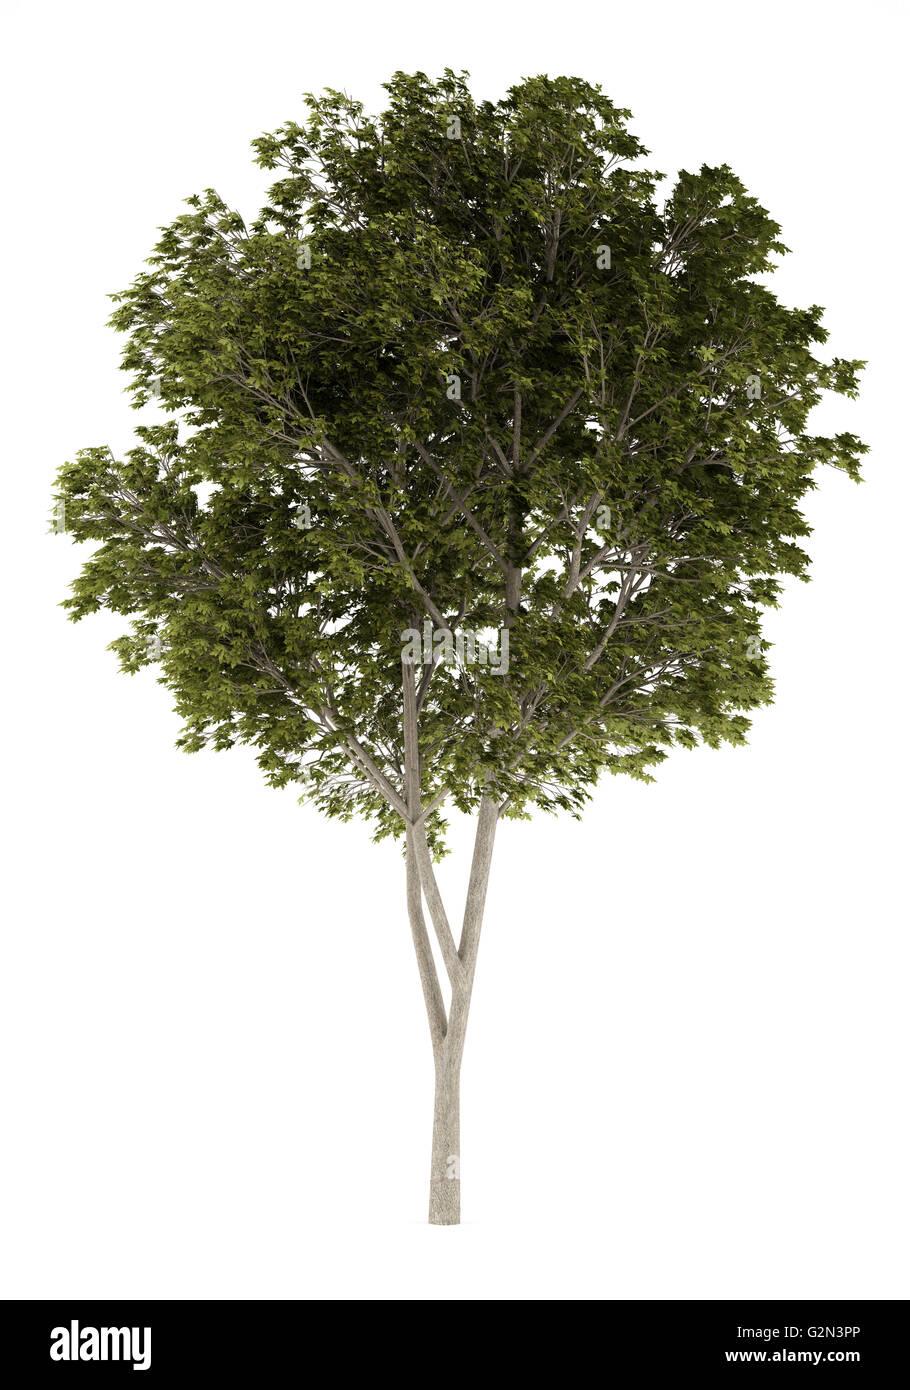 austrian oak tree isolated on white background stock photo